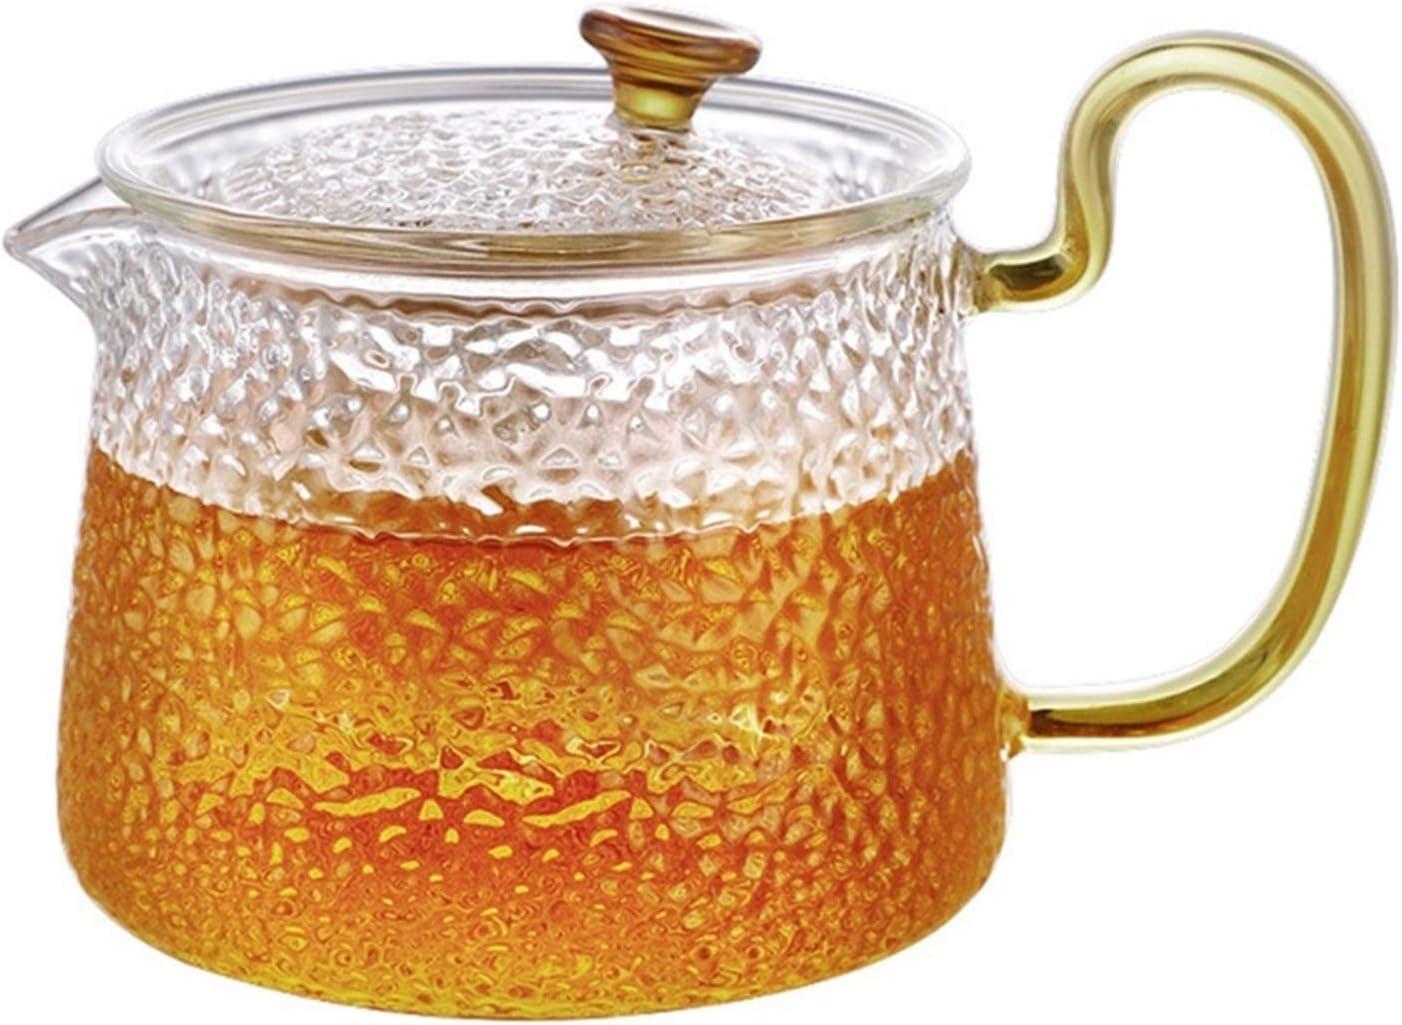 Youdert Teapot Genuine Tea Pots with Glasses Outlet SALE T 2 Ware Cups Cheap